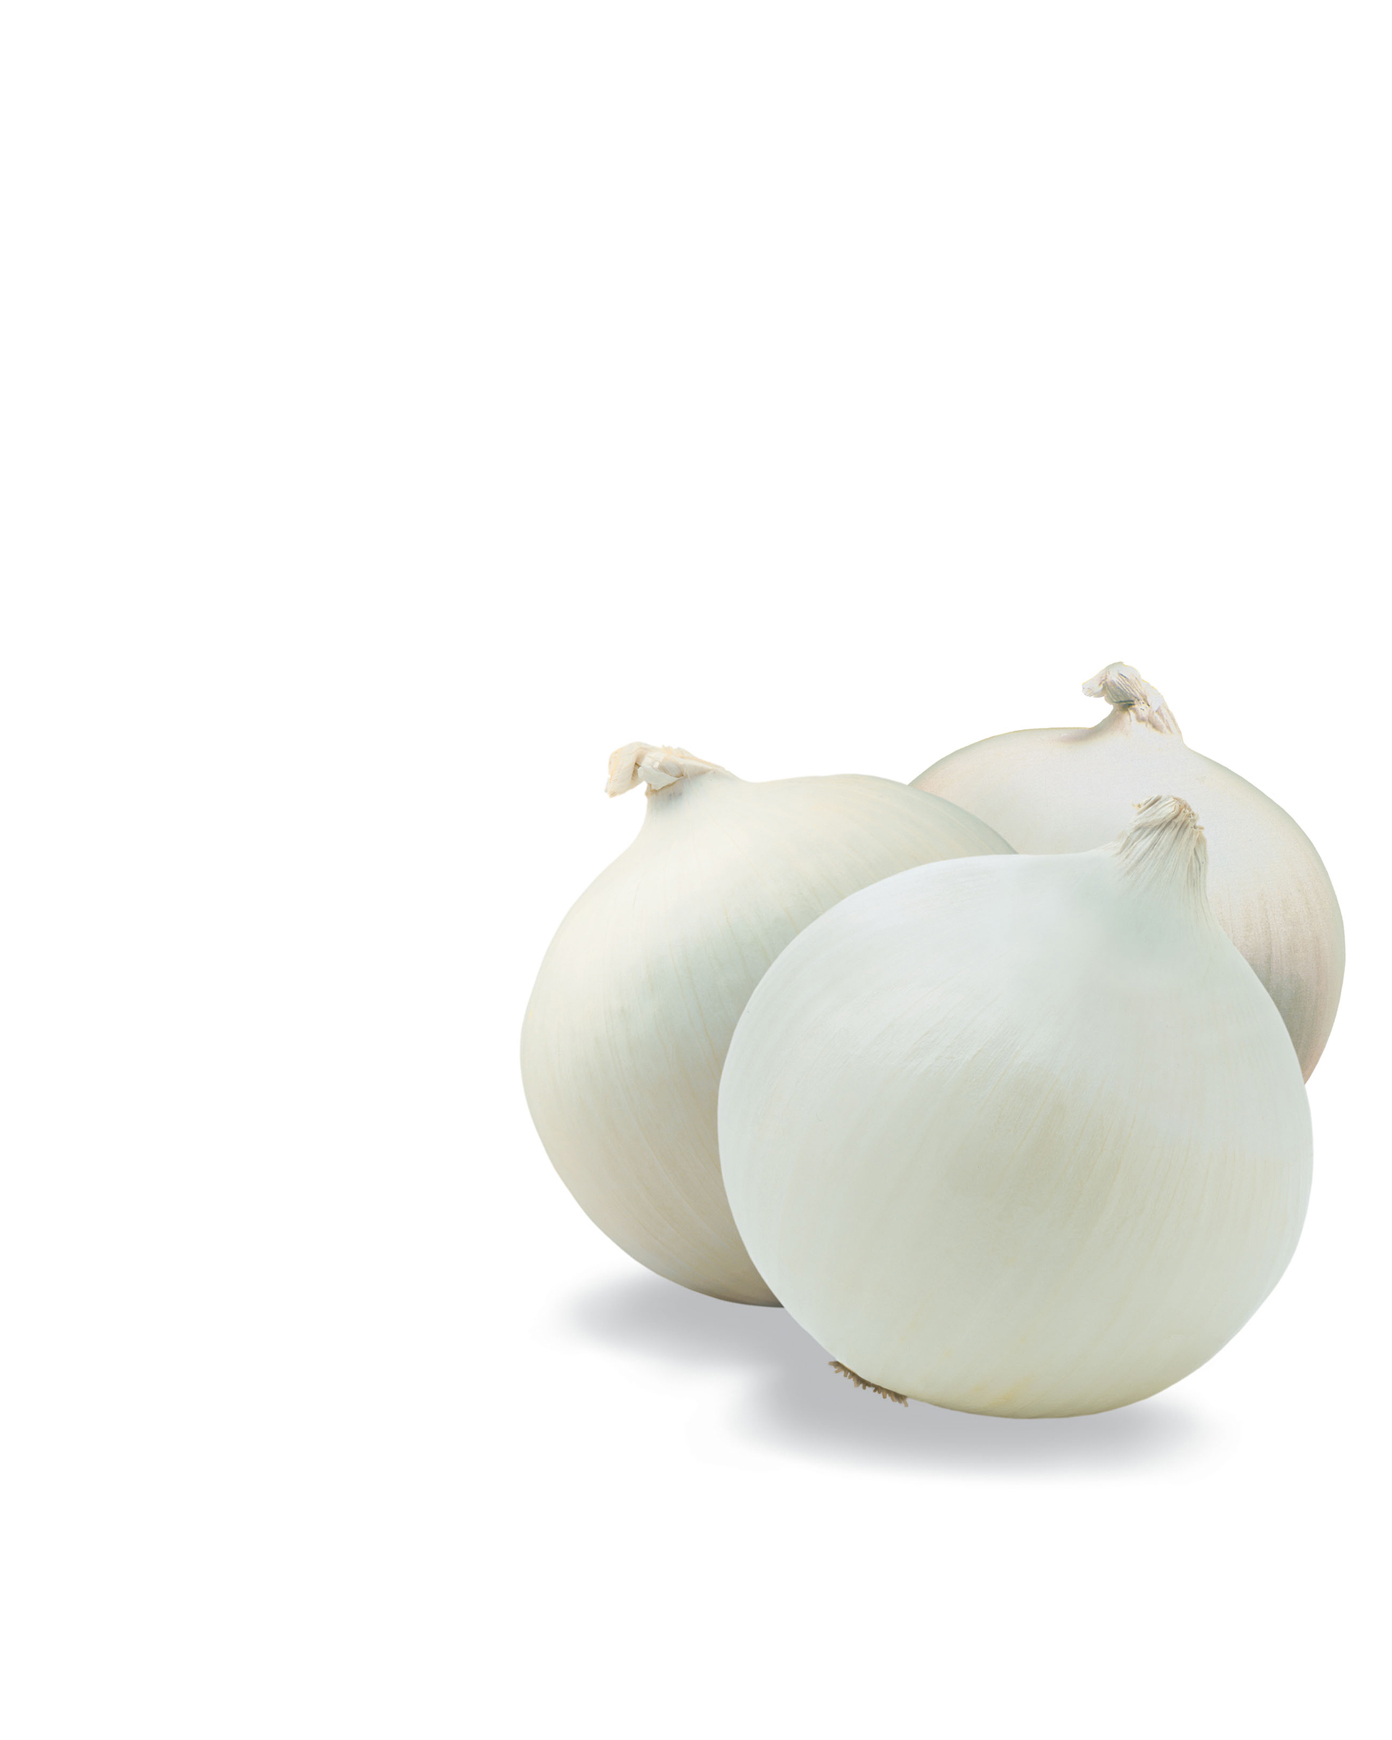 white_onions copy.jpg